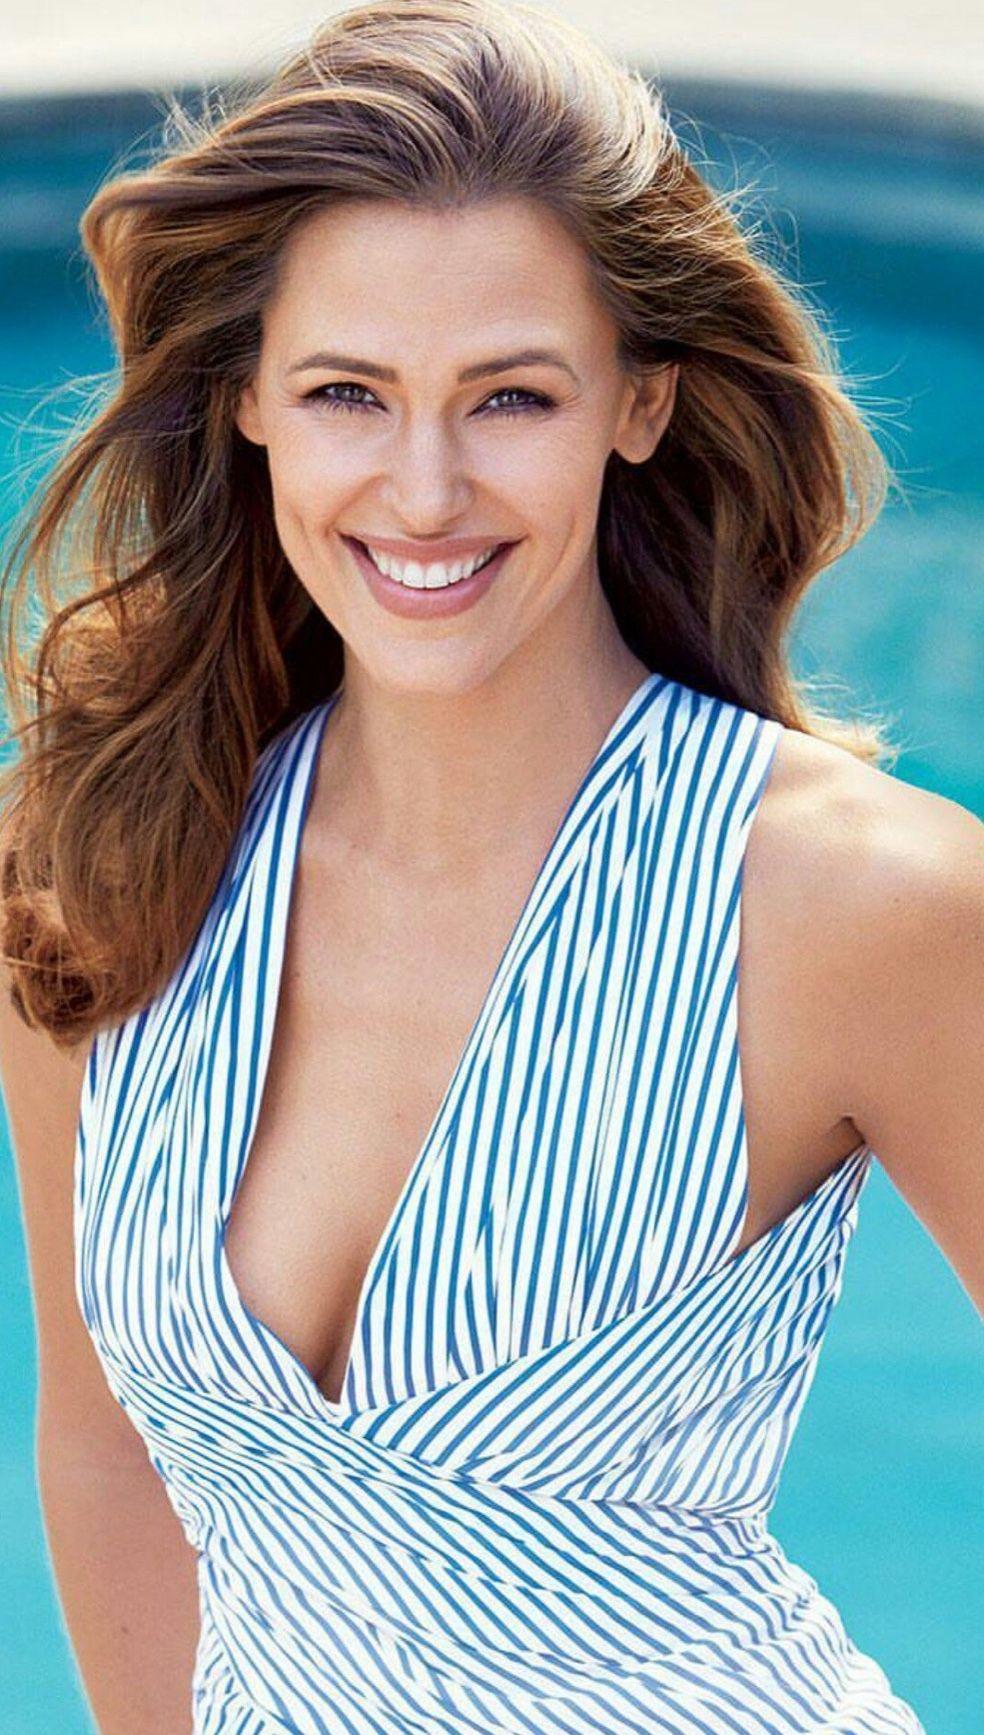 Photo of Jennifer Anne Garner, middle class Jennifer Anne Affleck (born April 17, 1972 in Hou …